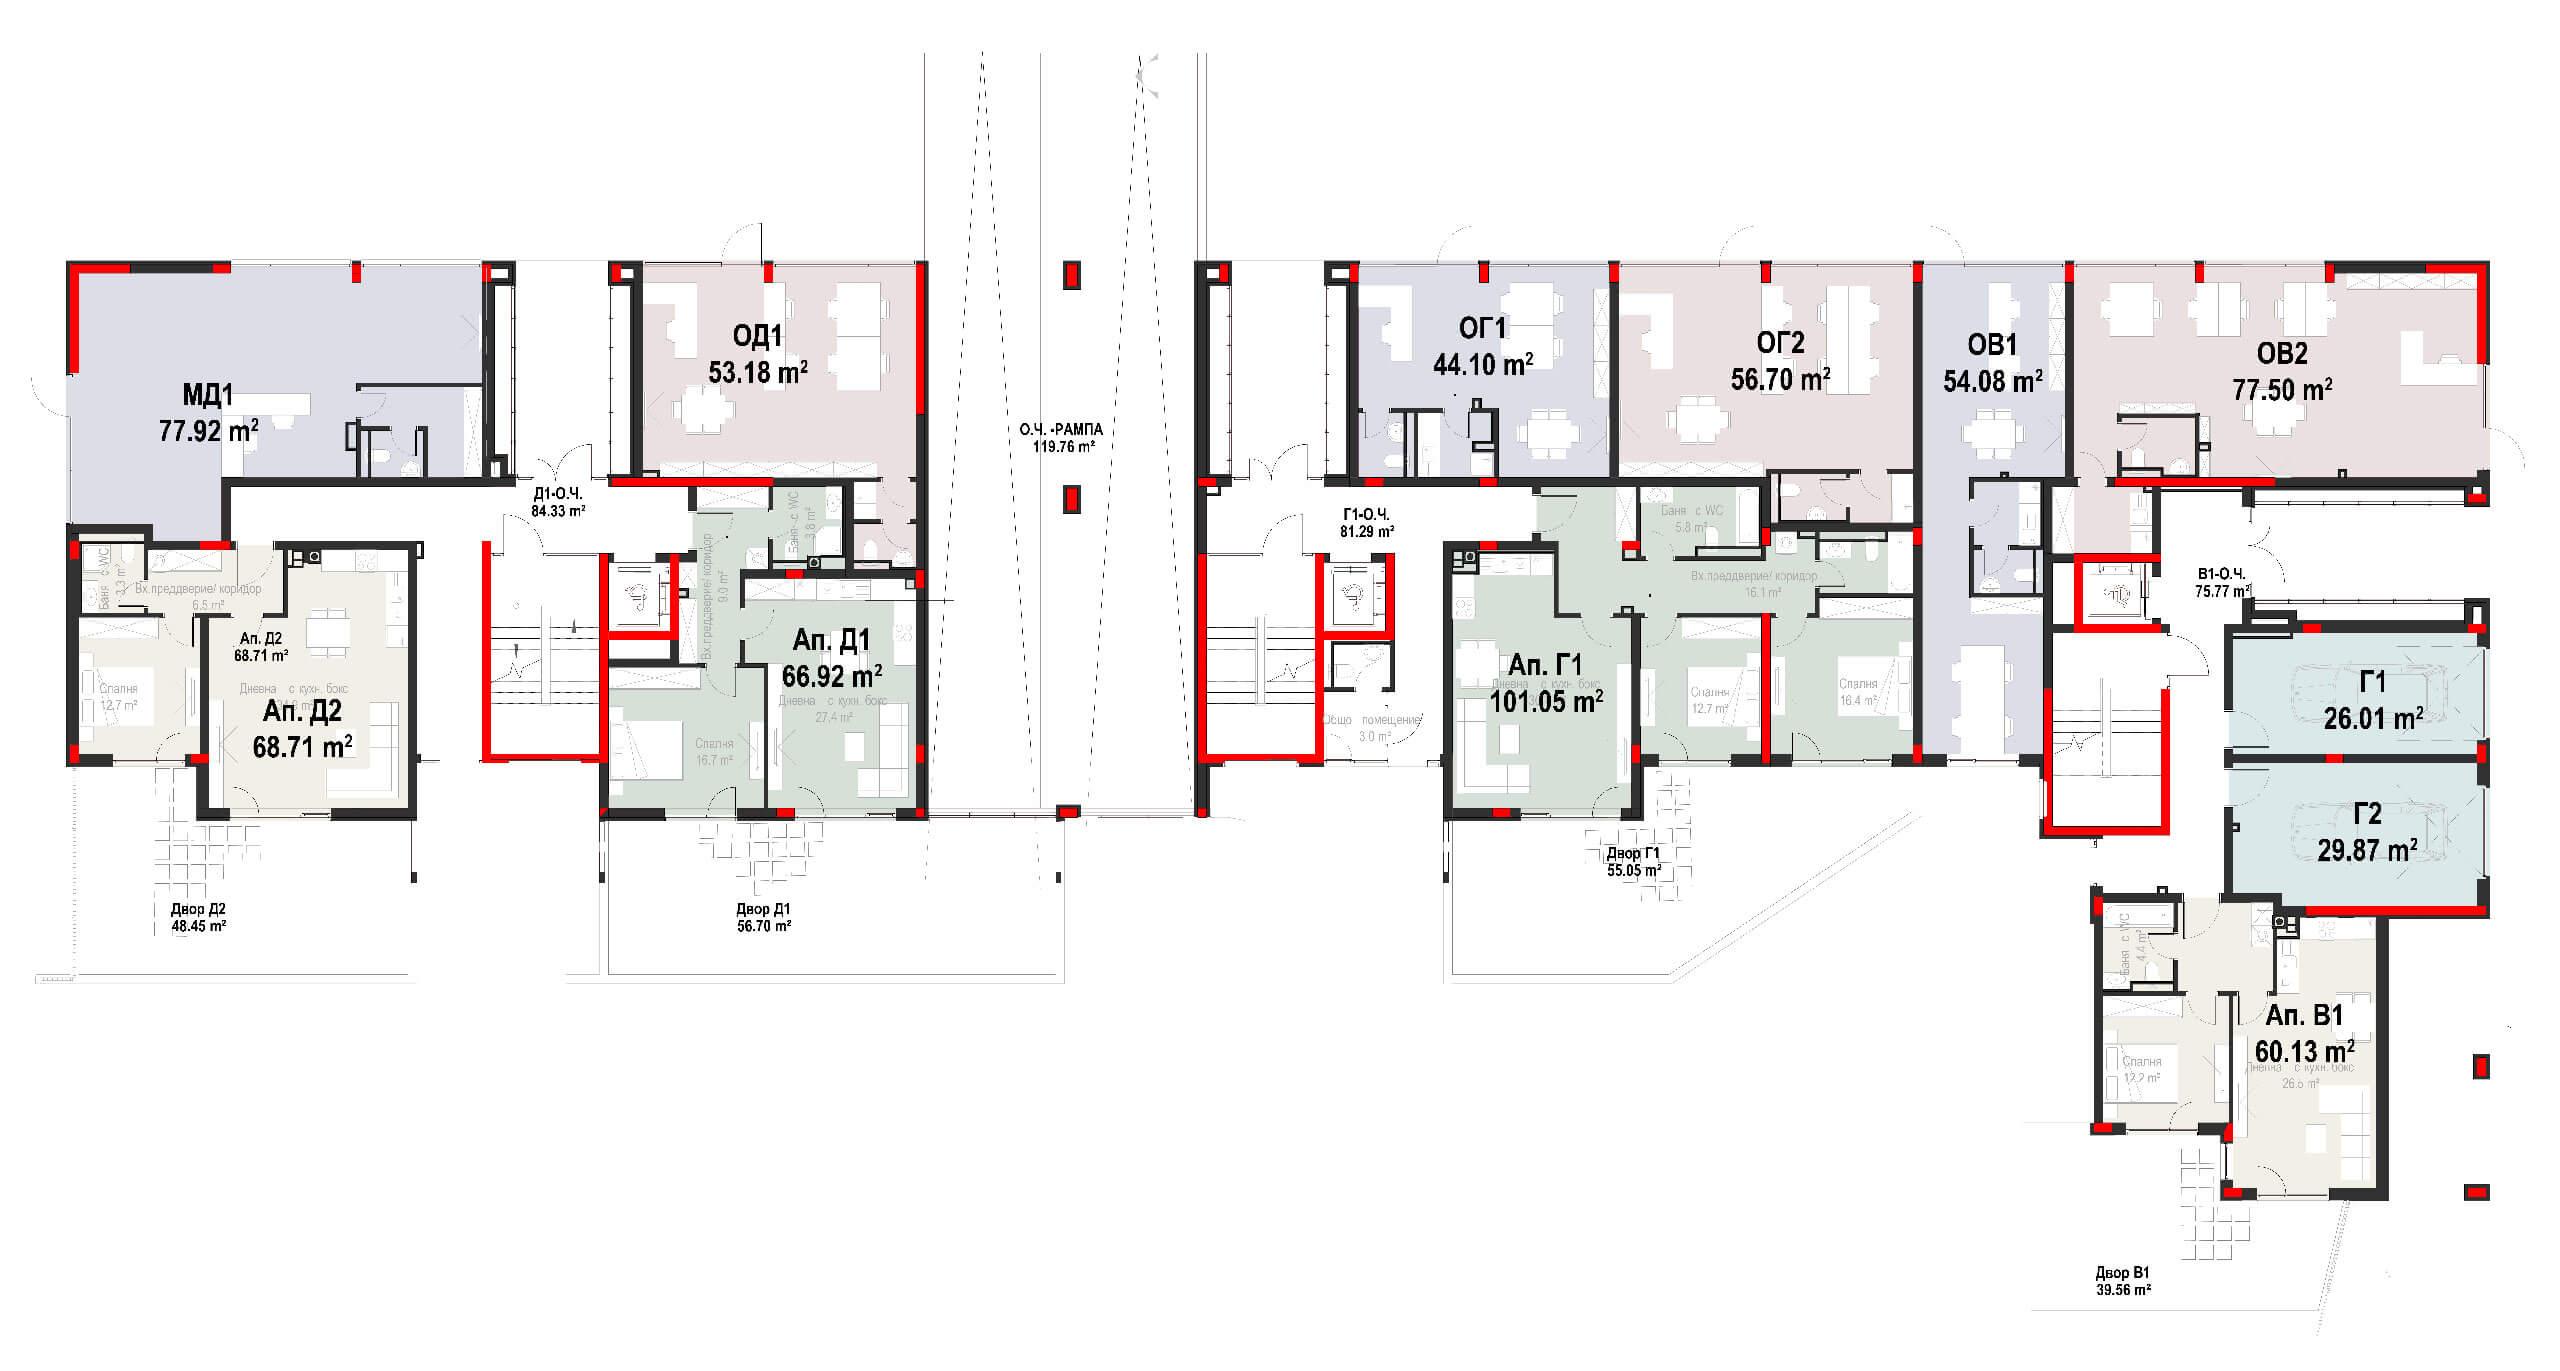 vitosha-apartment2-sg2-level1